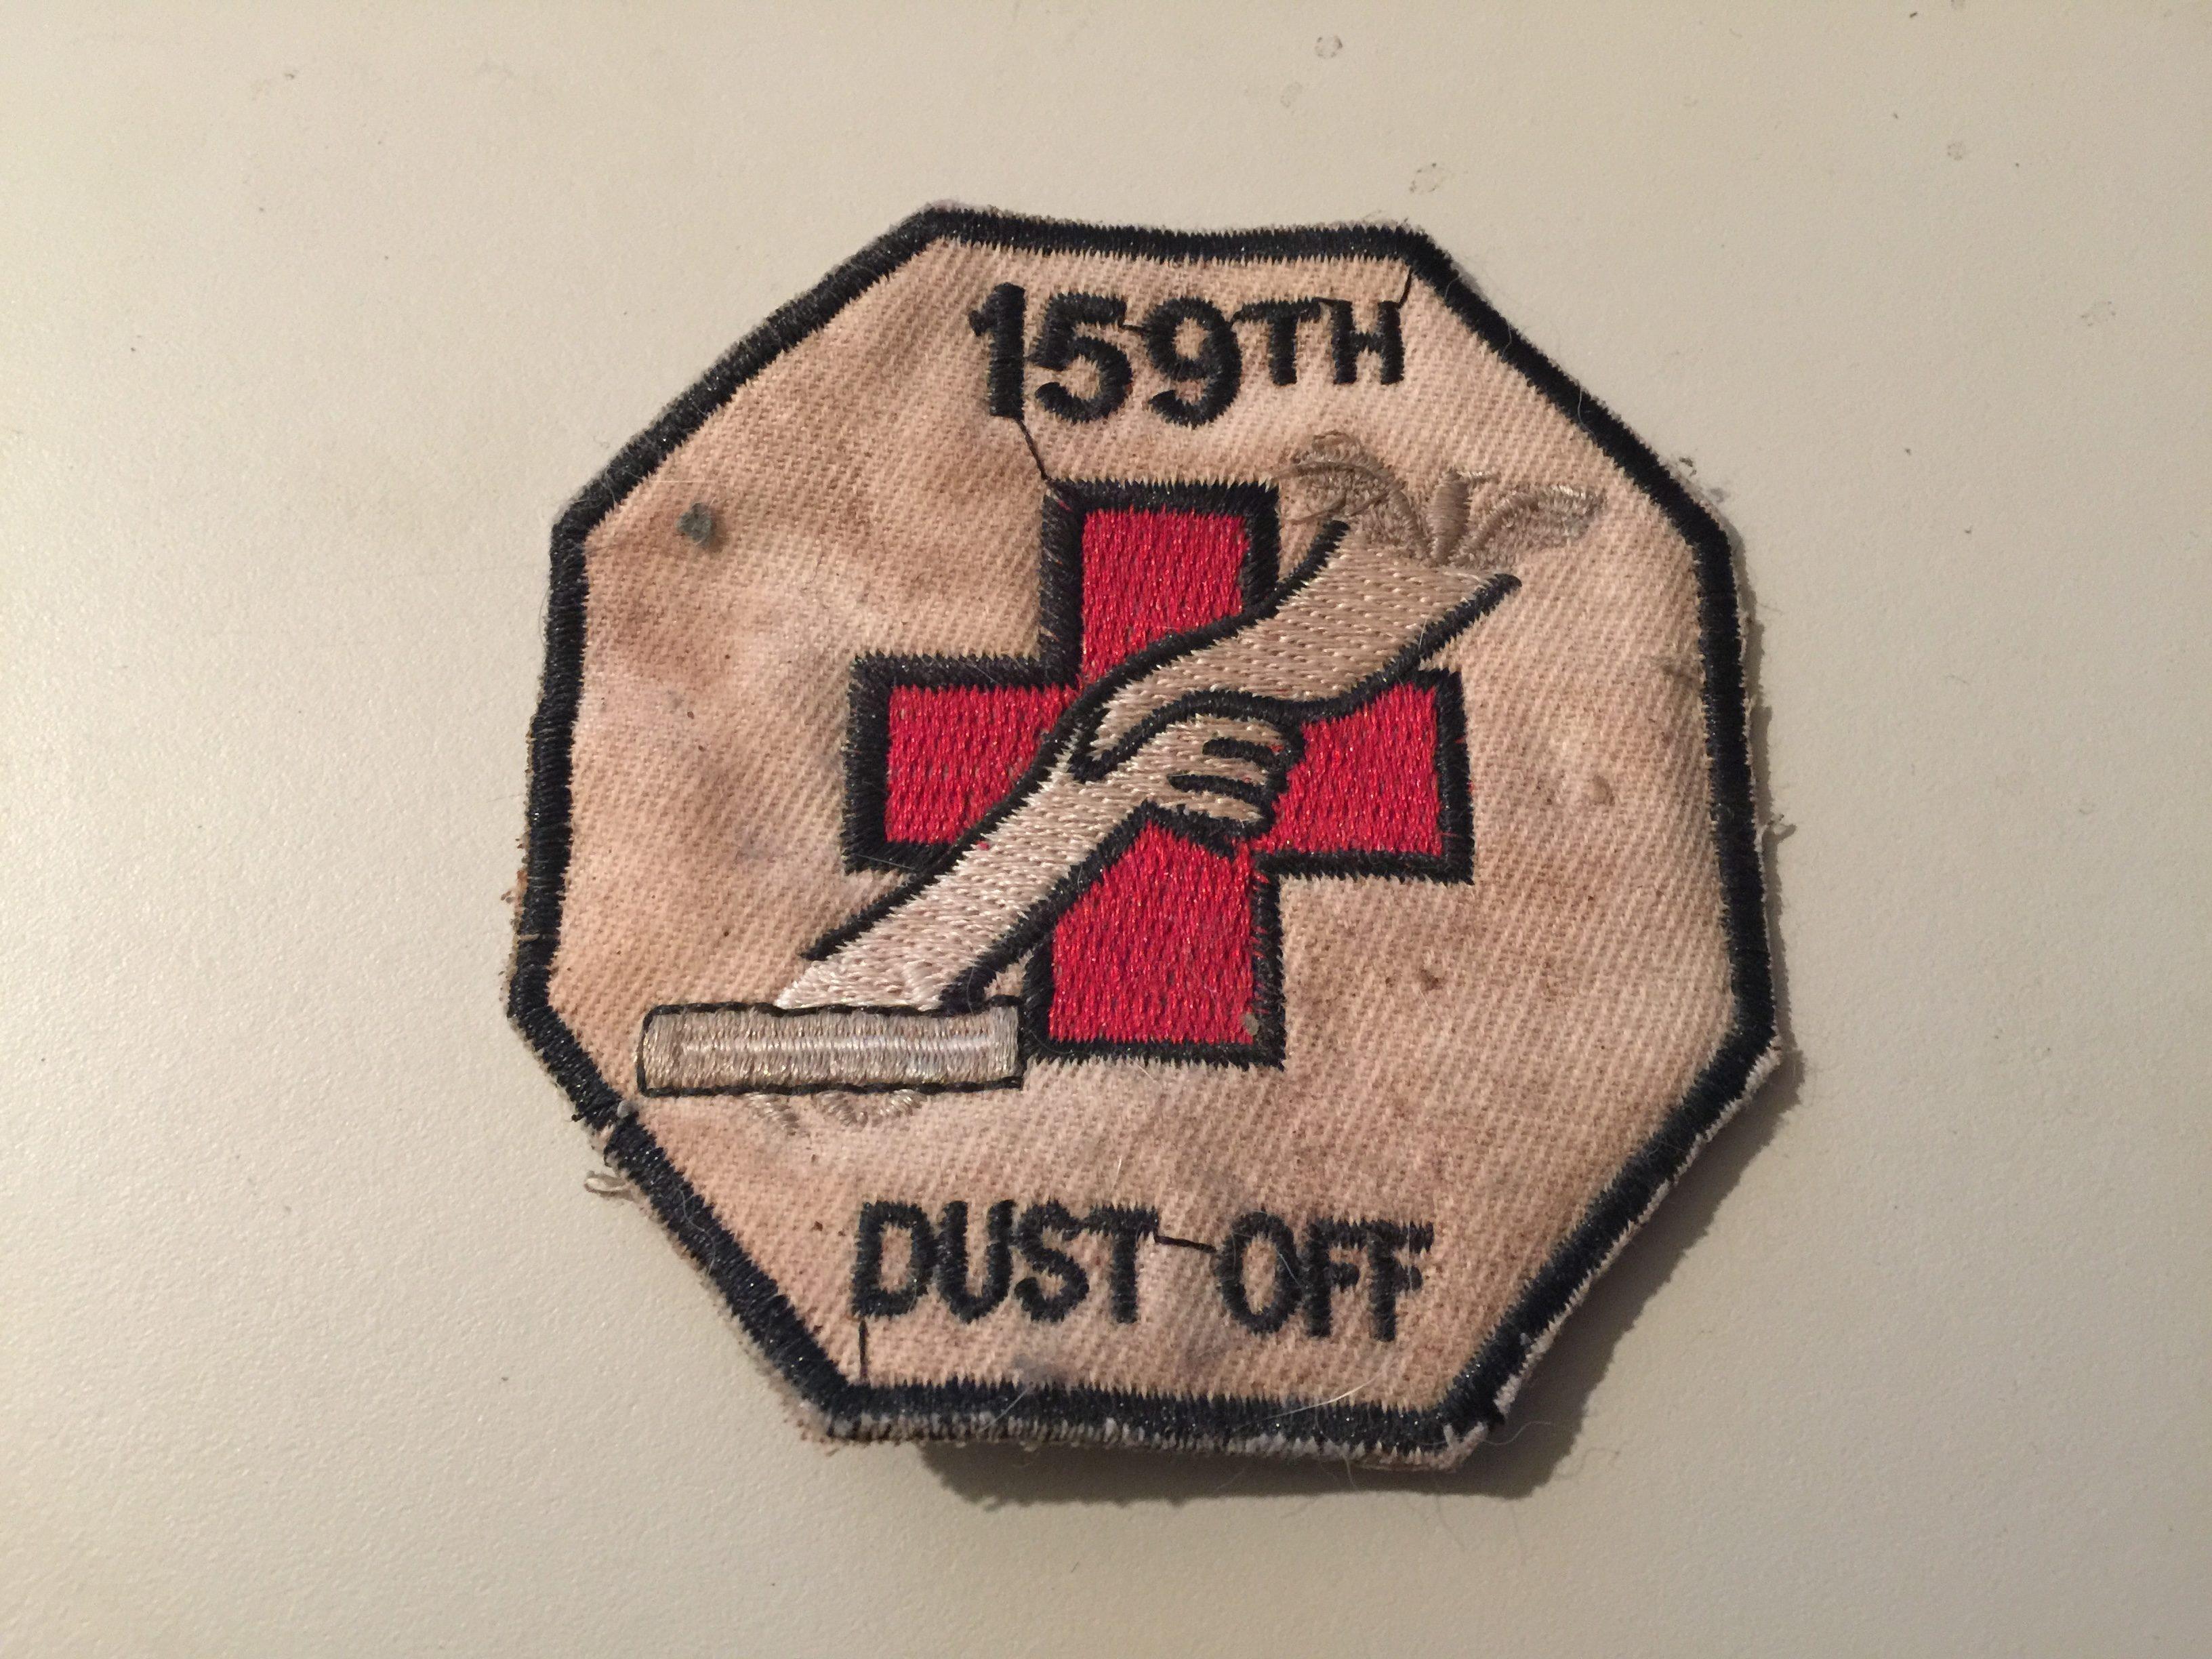 159th MEDICAL DETACHMENT - HELICOPTER MEDEVAC